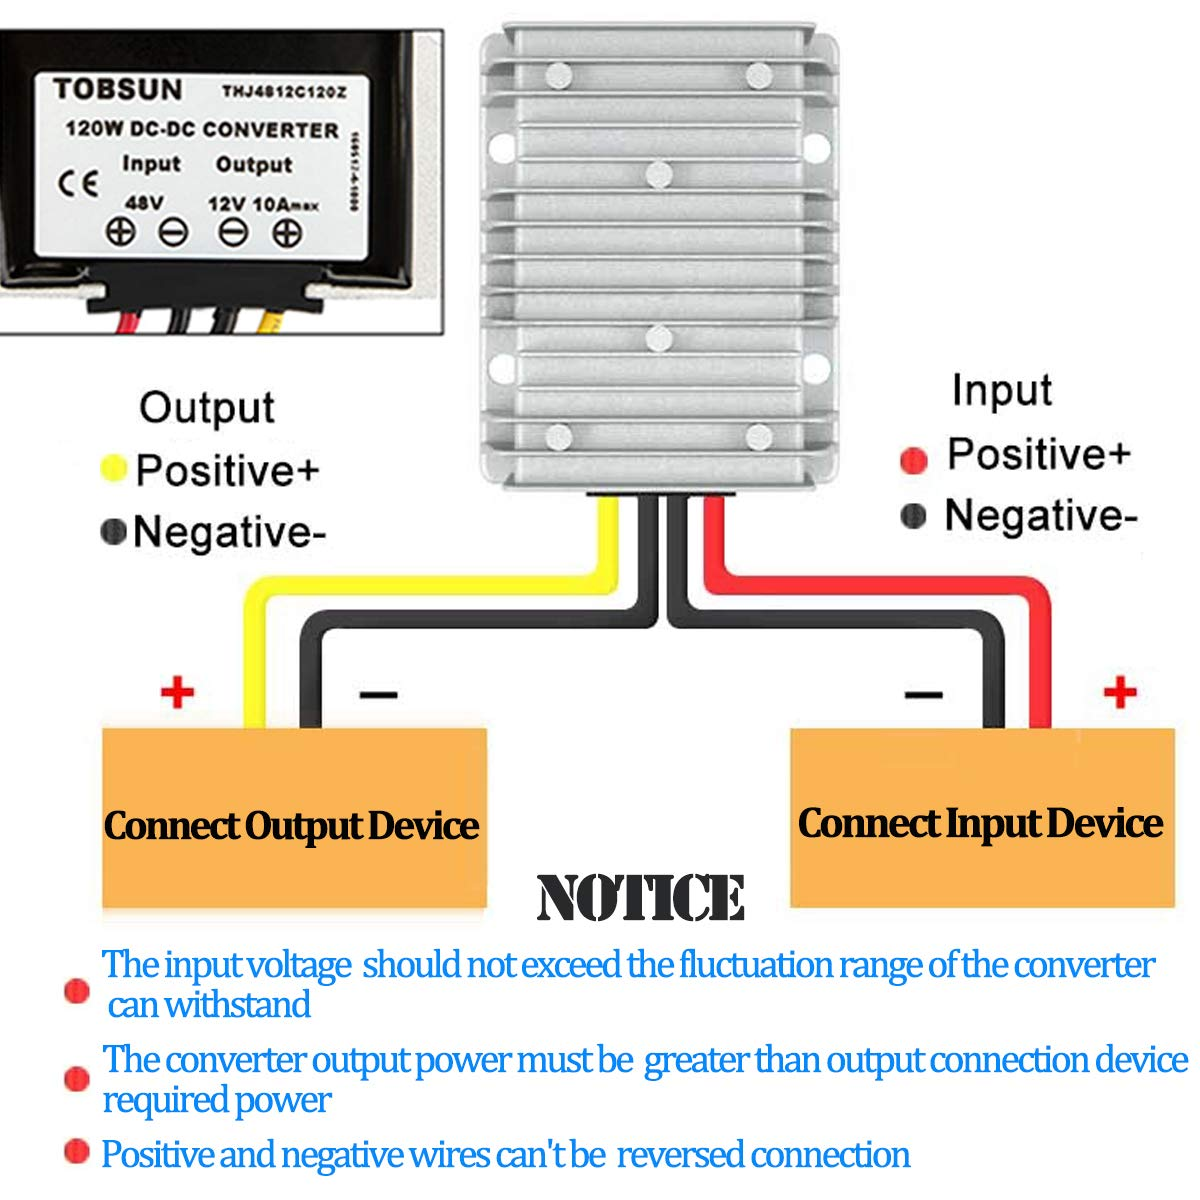 Golf CART Voltage Reducer Converter 48V to 12V 10A 120W Mad Jax Inverter Wiring Diagram on